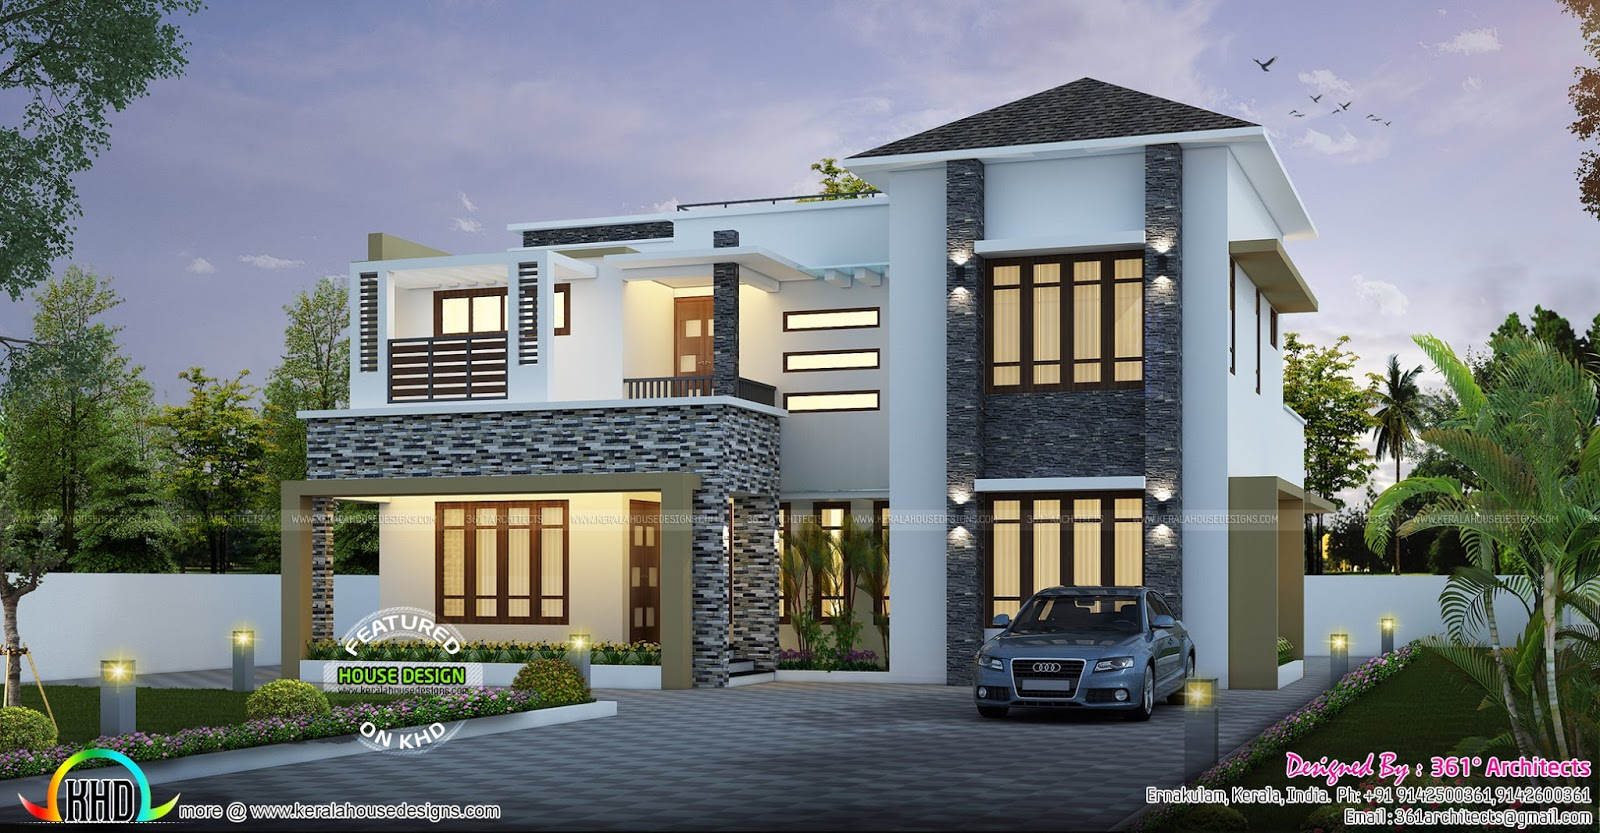 2403 Sq Ft Modern Contemporary Home Kerala Home Design